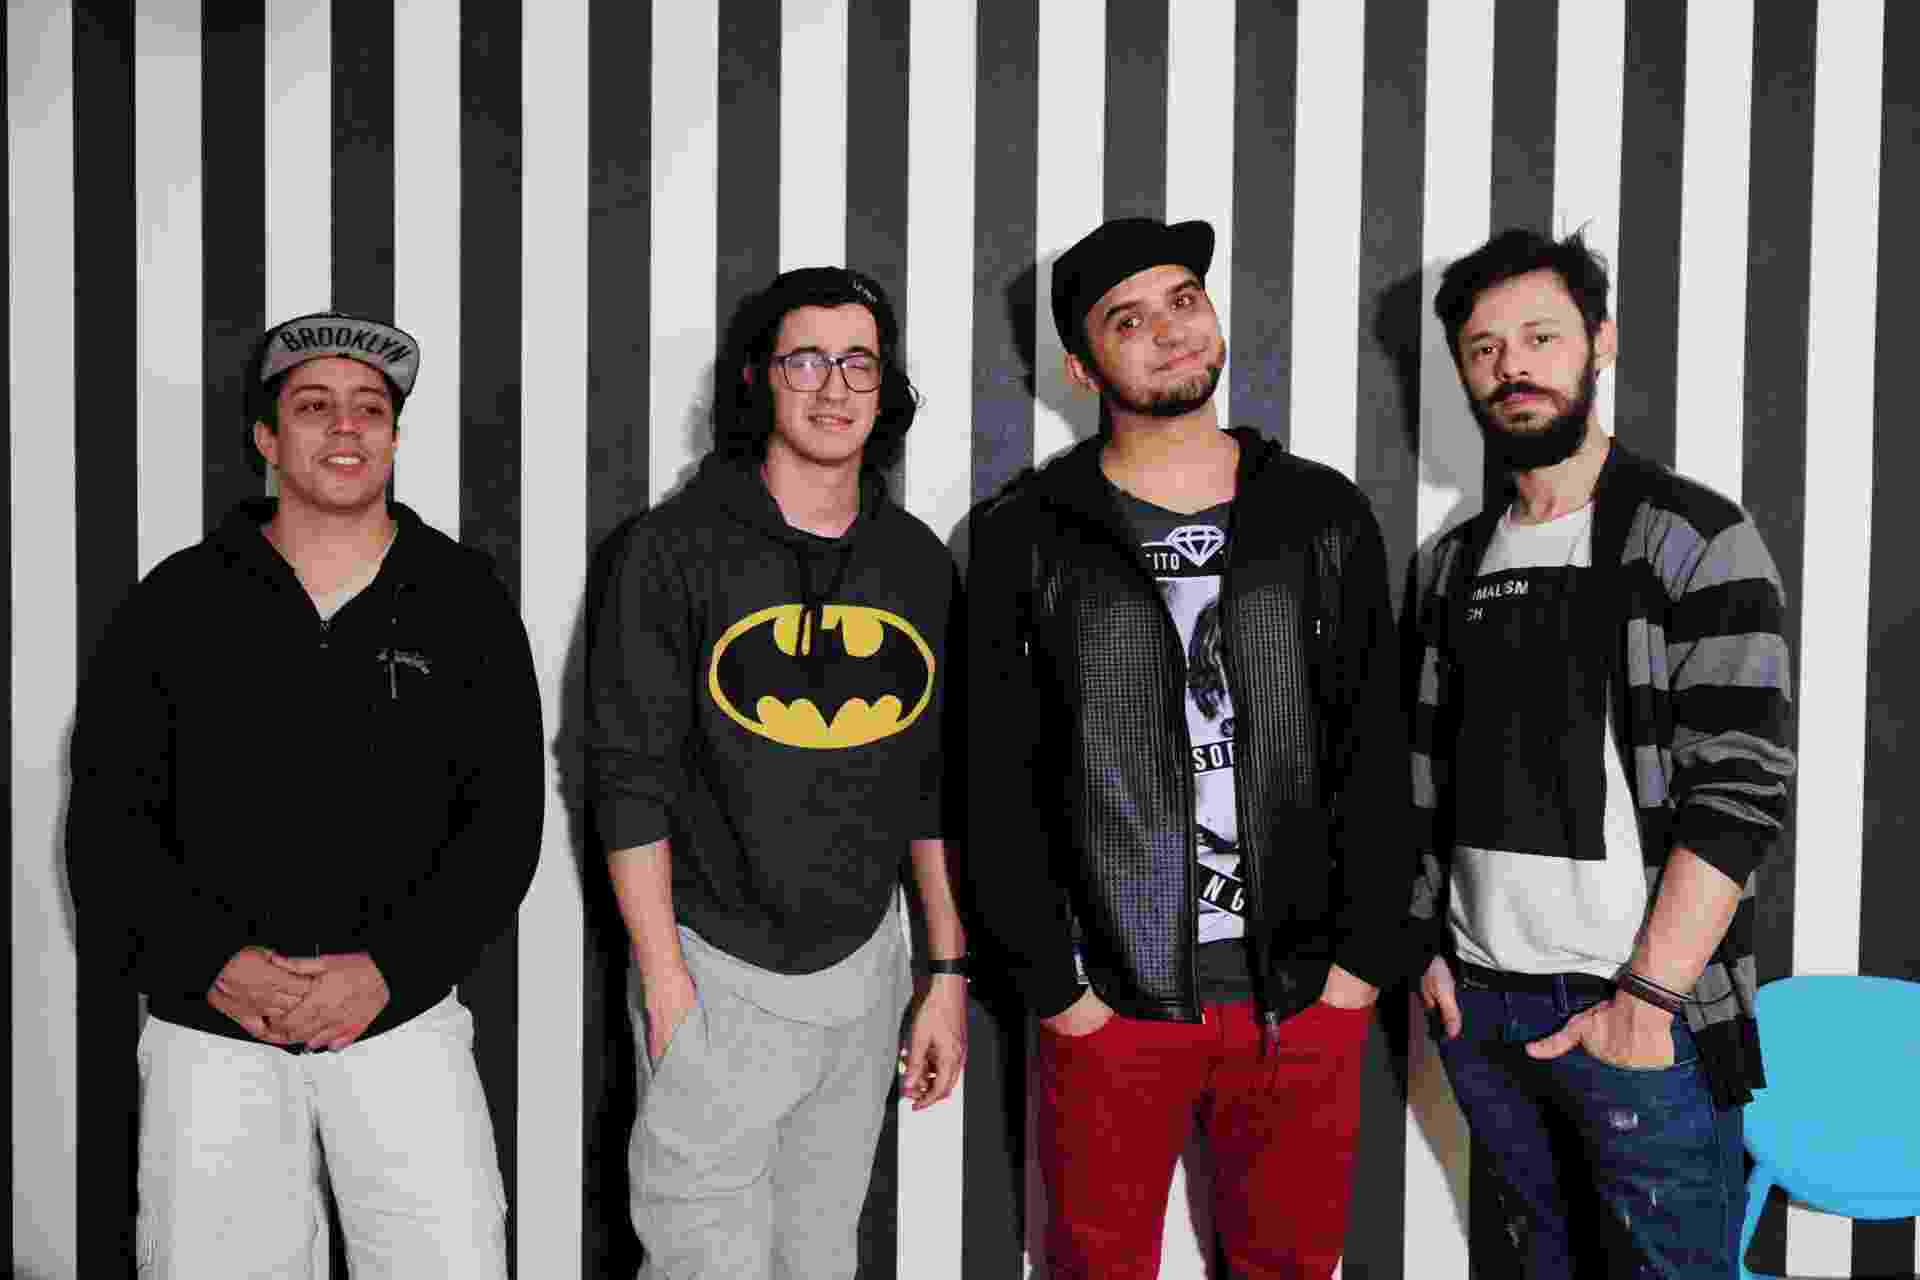 Da esquerda para a direita, os humoristas Renato Albani, Afonso Padilha, Thiago Ventura e Nando Viana - Junior Lago/UOL